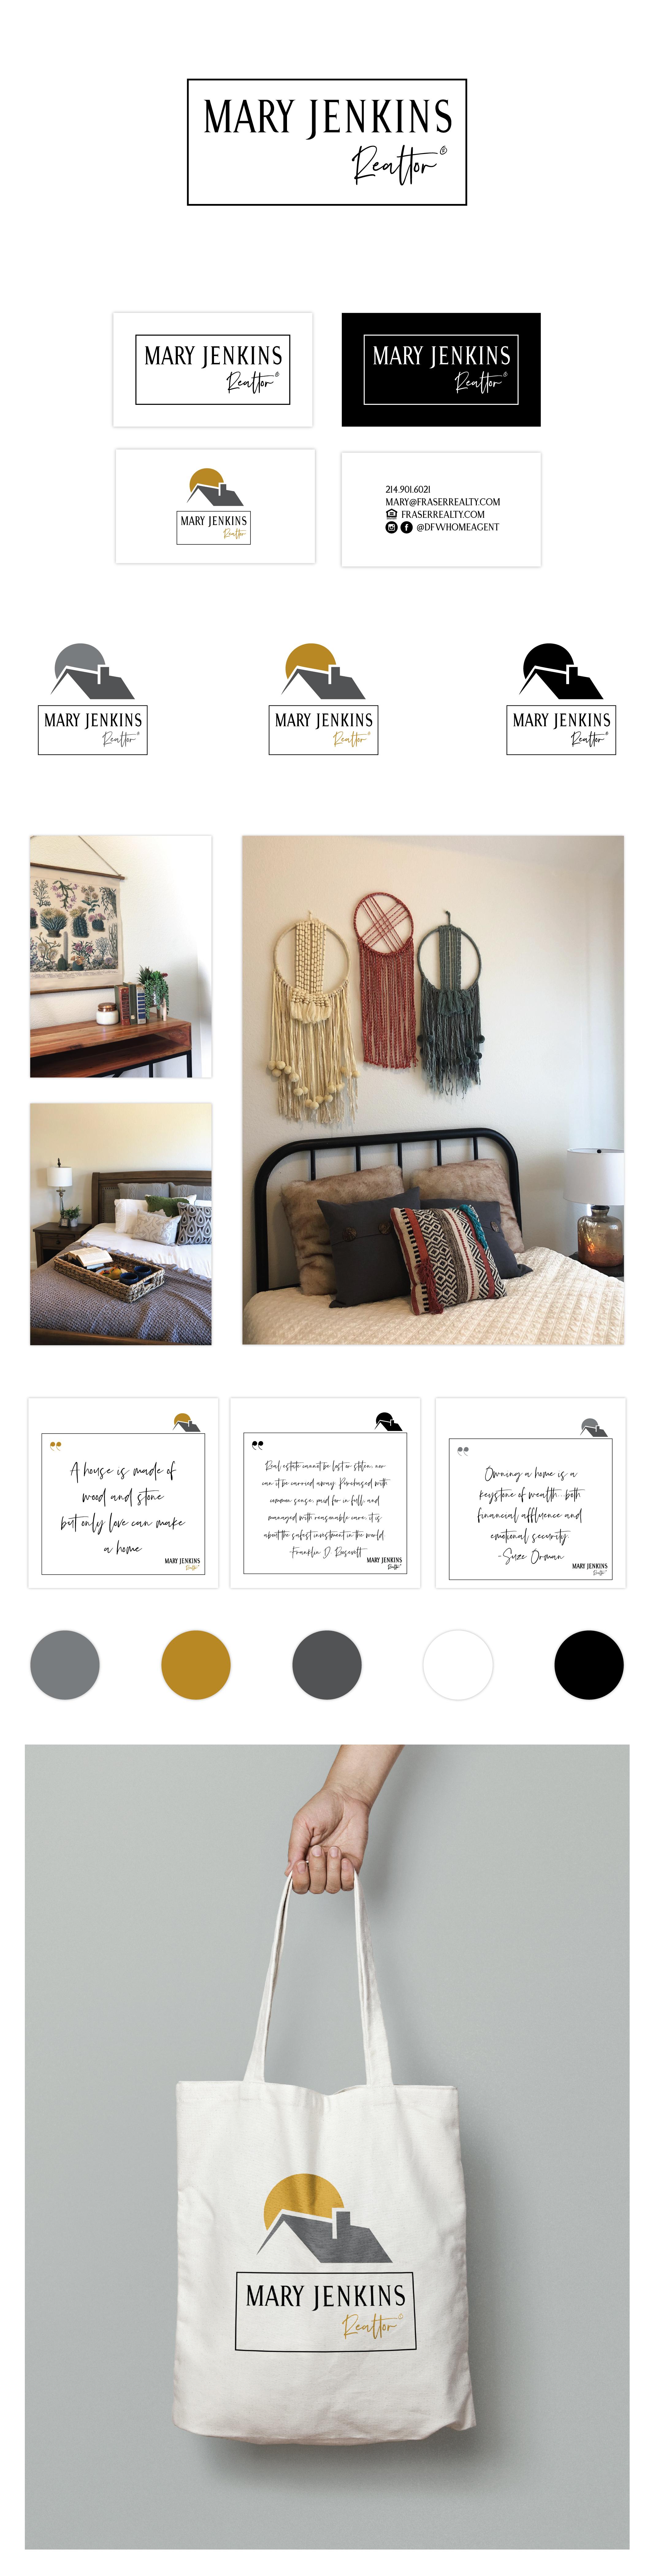 Website Branding Images-02.png